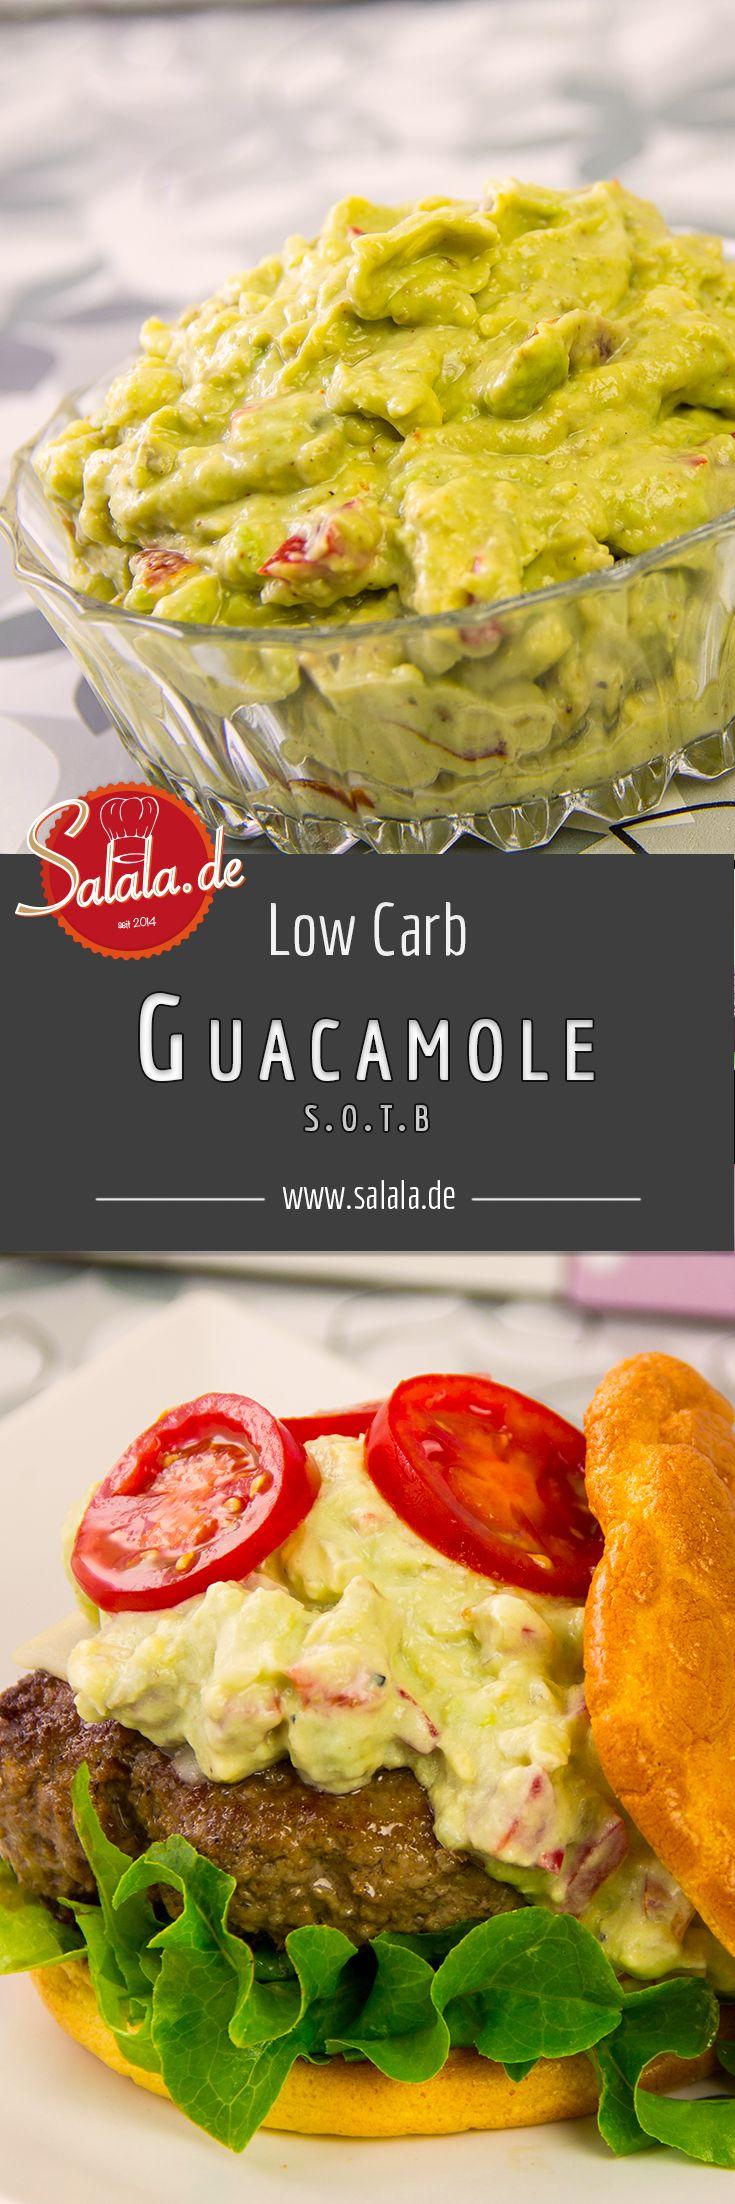 Guacamole (s.o.t.b) – Avocado Creme Low Carb   – Low Carb Kochrezepte deutsch